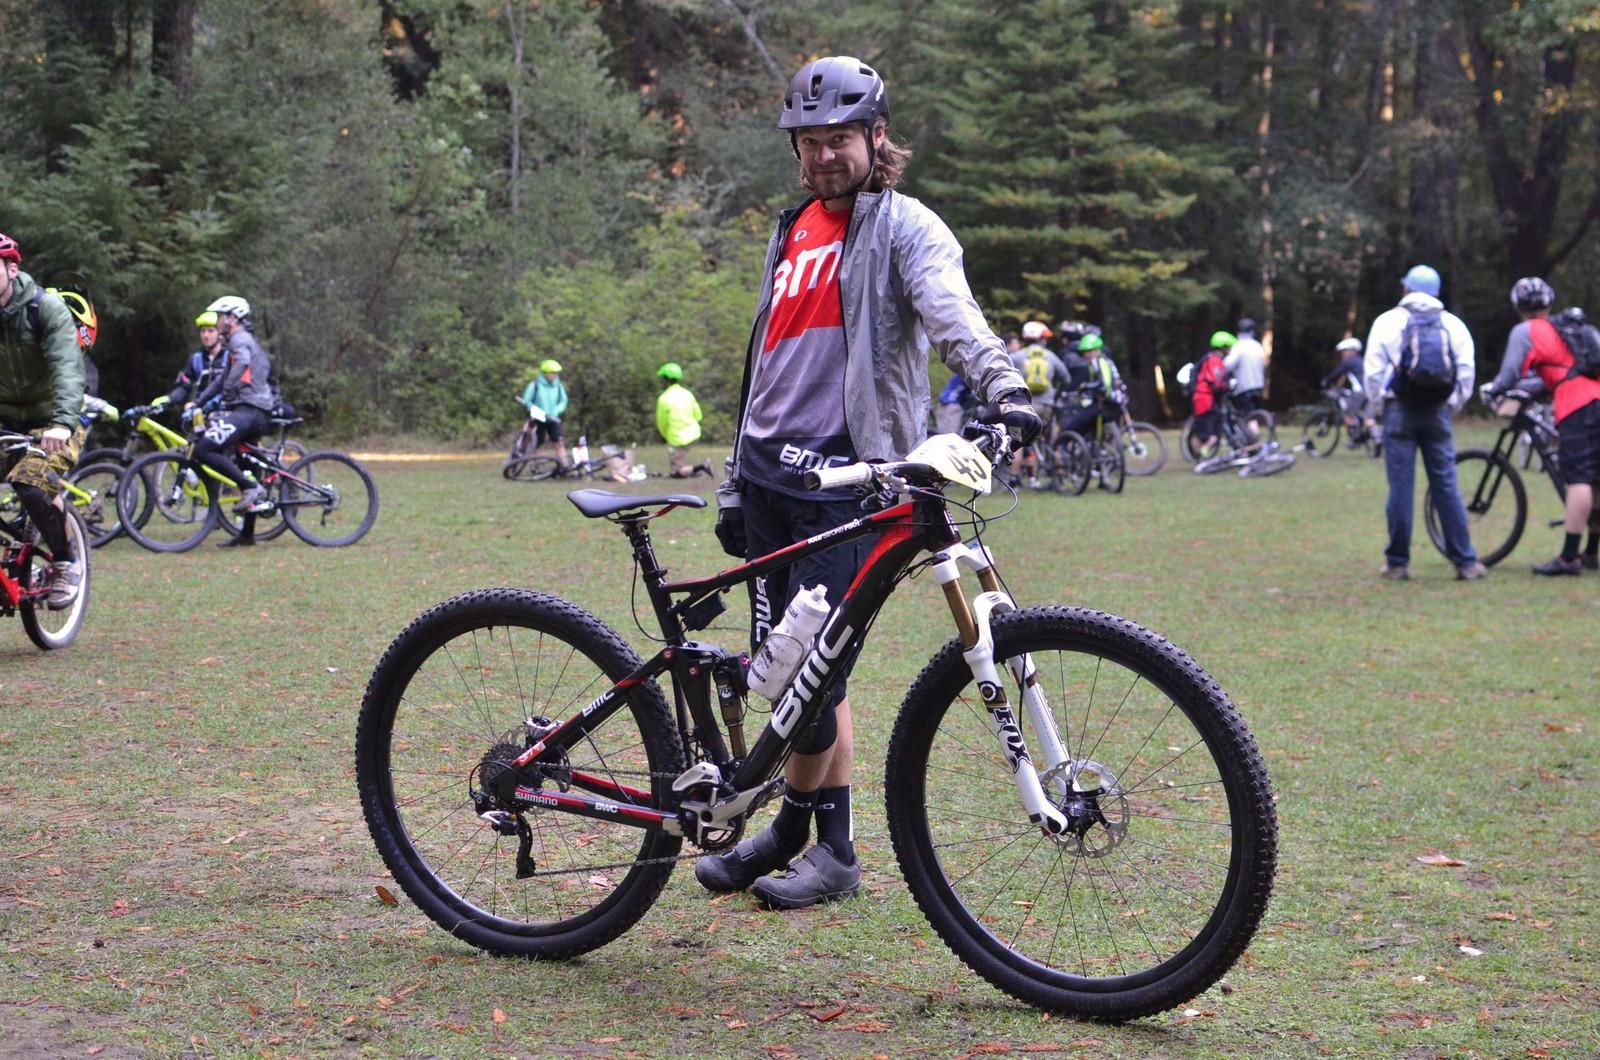 PIT BITS from the Santa Cruz Super Enduro: Aaron Bradford's BMC FourStroke FS01 29er - PIT BITS - 2013 Santa Cruz Super Enduro - Mountain Biking Pictures - Vital MTB